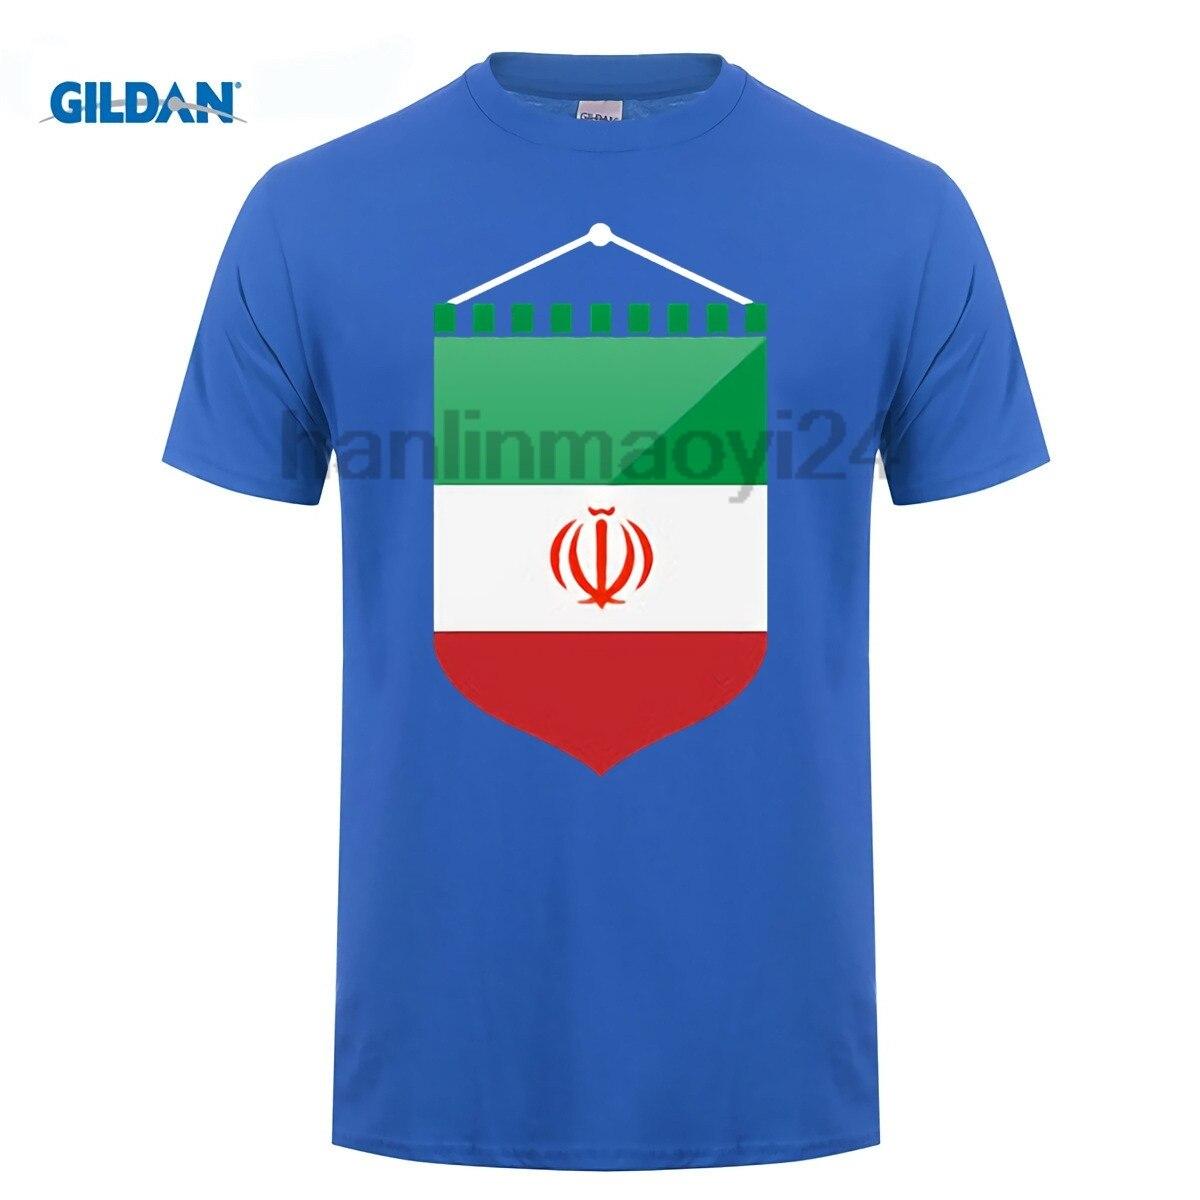 GILDAN Iran National Flag T shirts For Men Fashion 100% Cotton Nostalgic Patriotic T-shirt Clothing